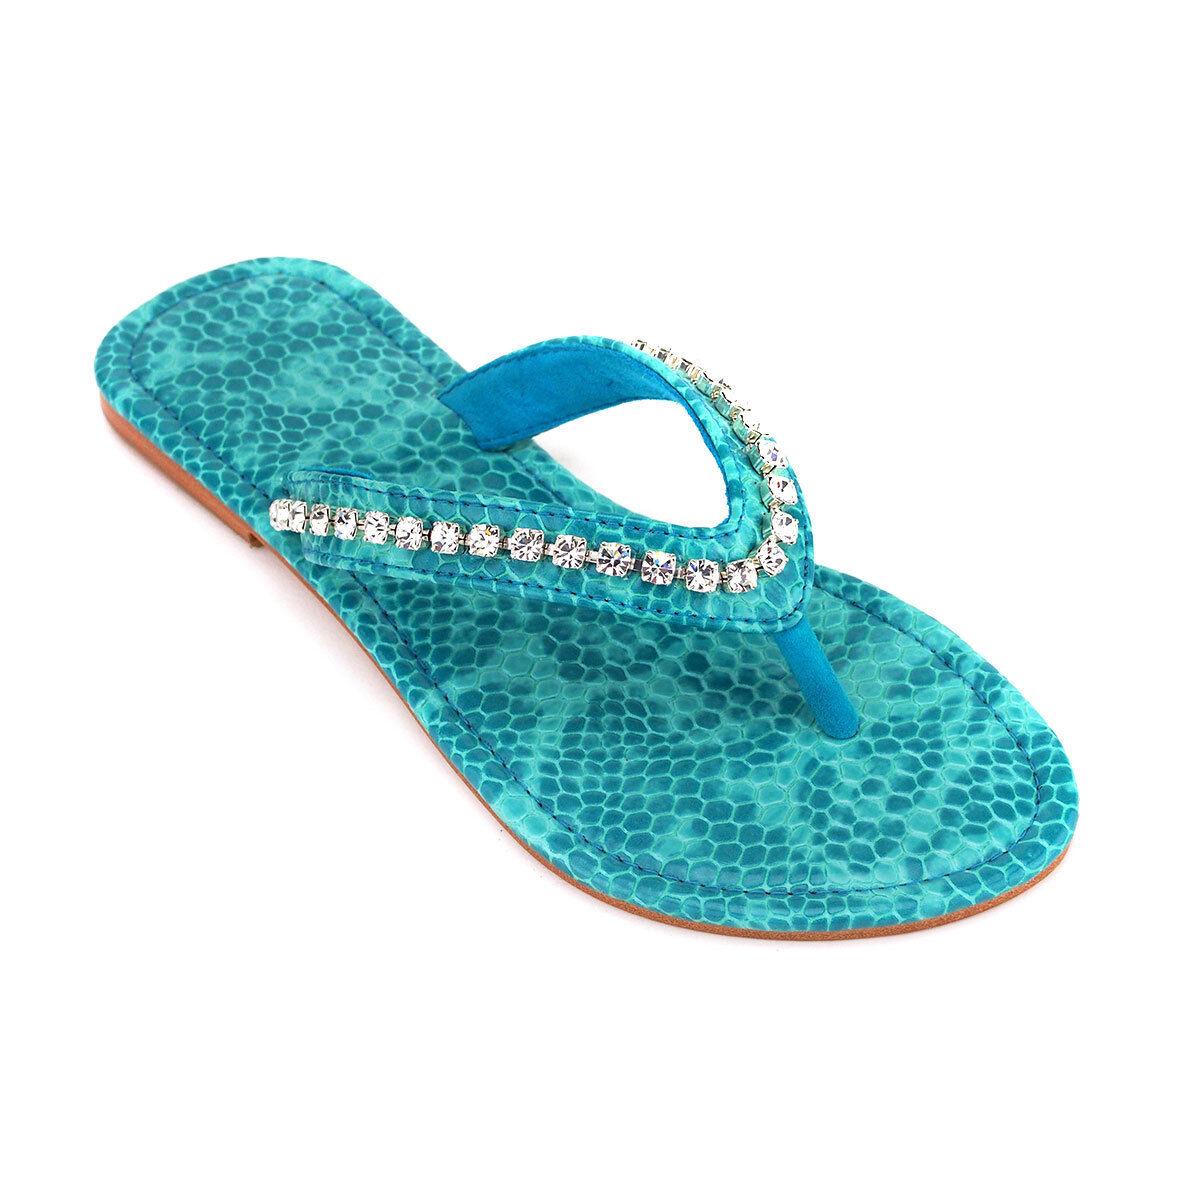 Pasha 'Tjorn' Embellished Snake-Effect Turquoise Leather Sandals